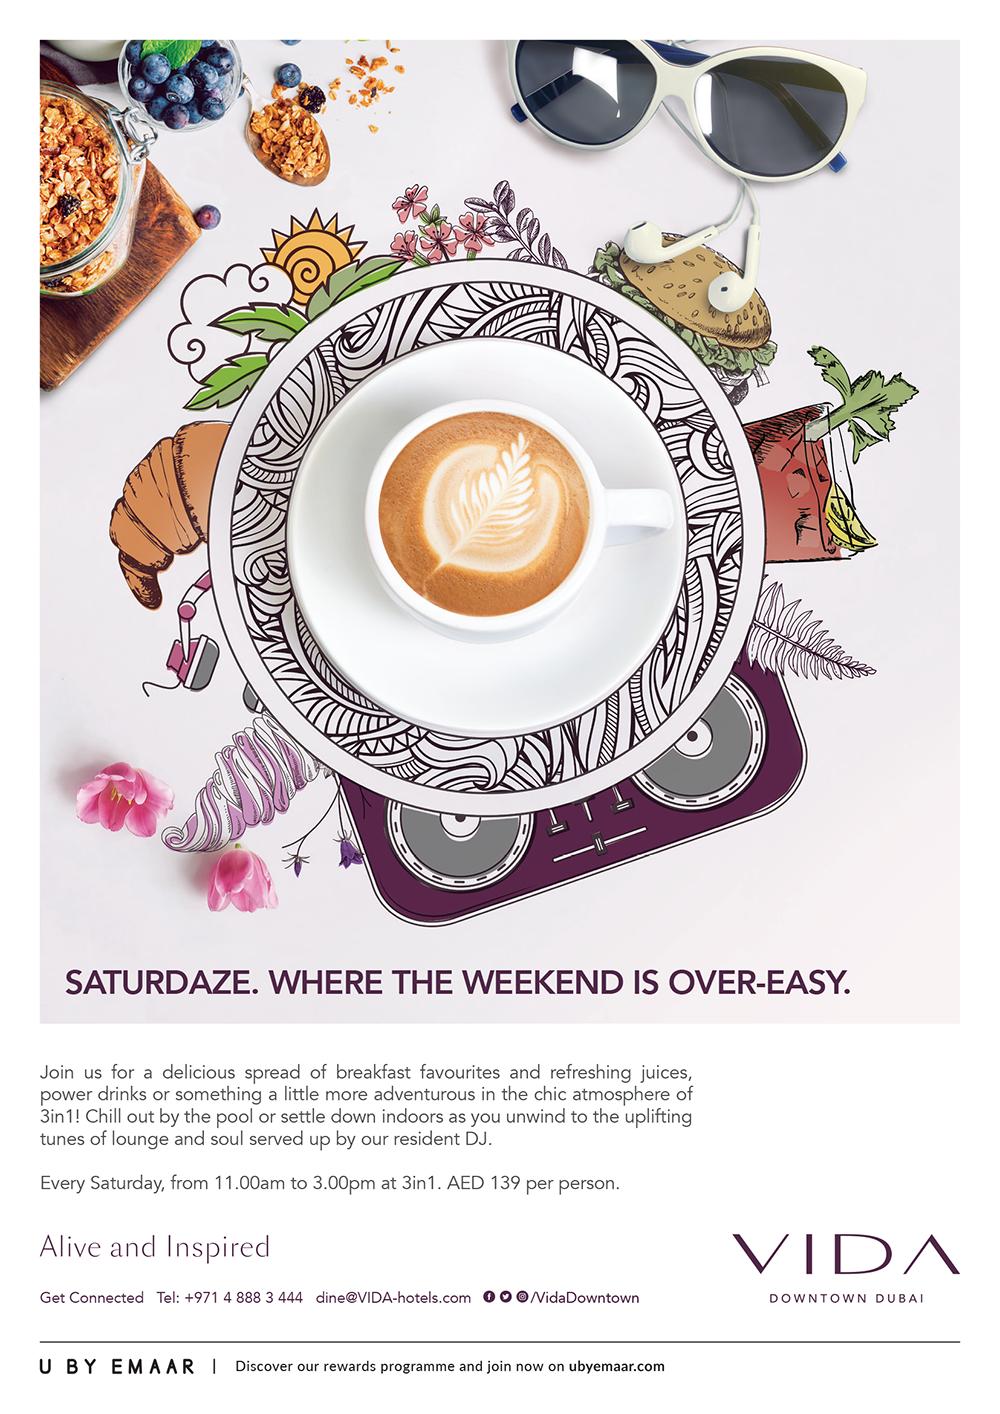 vhr-2016-saturdaze-brunch-campaign-advert